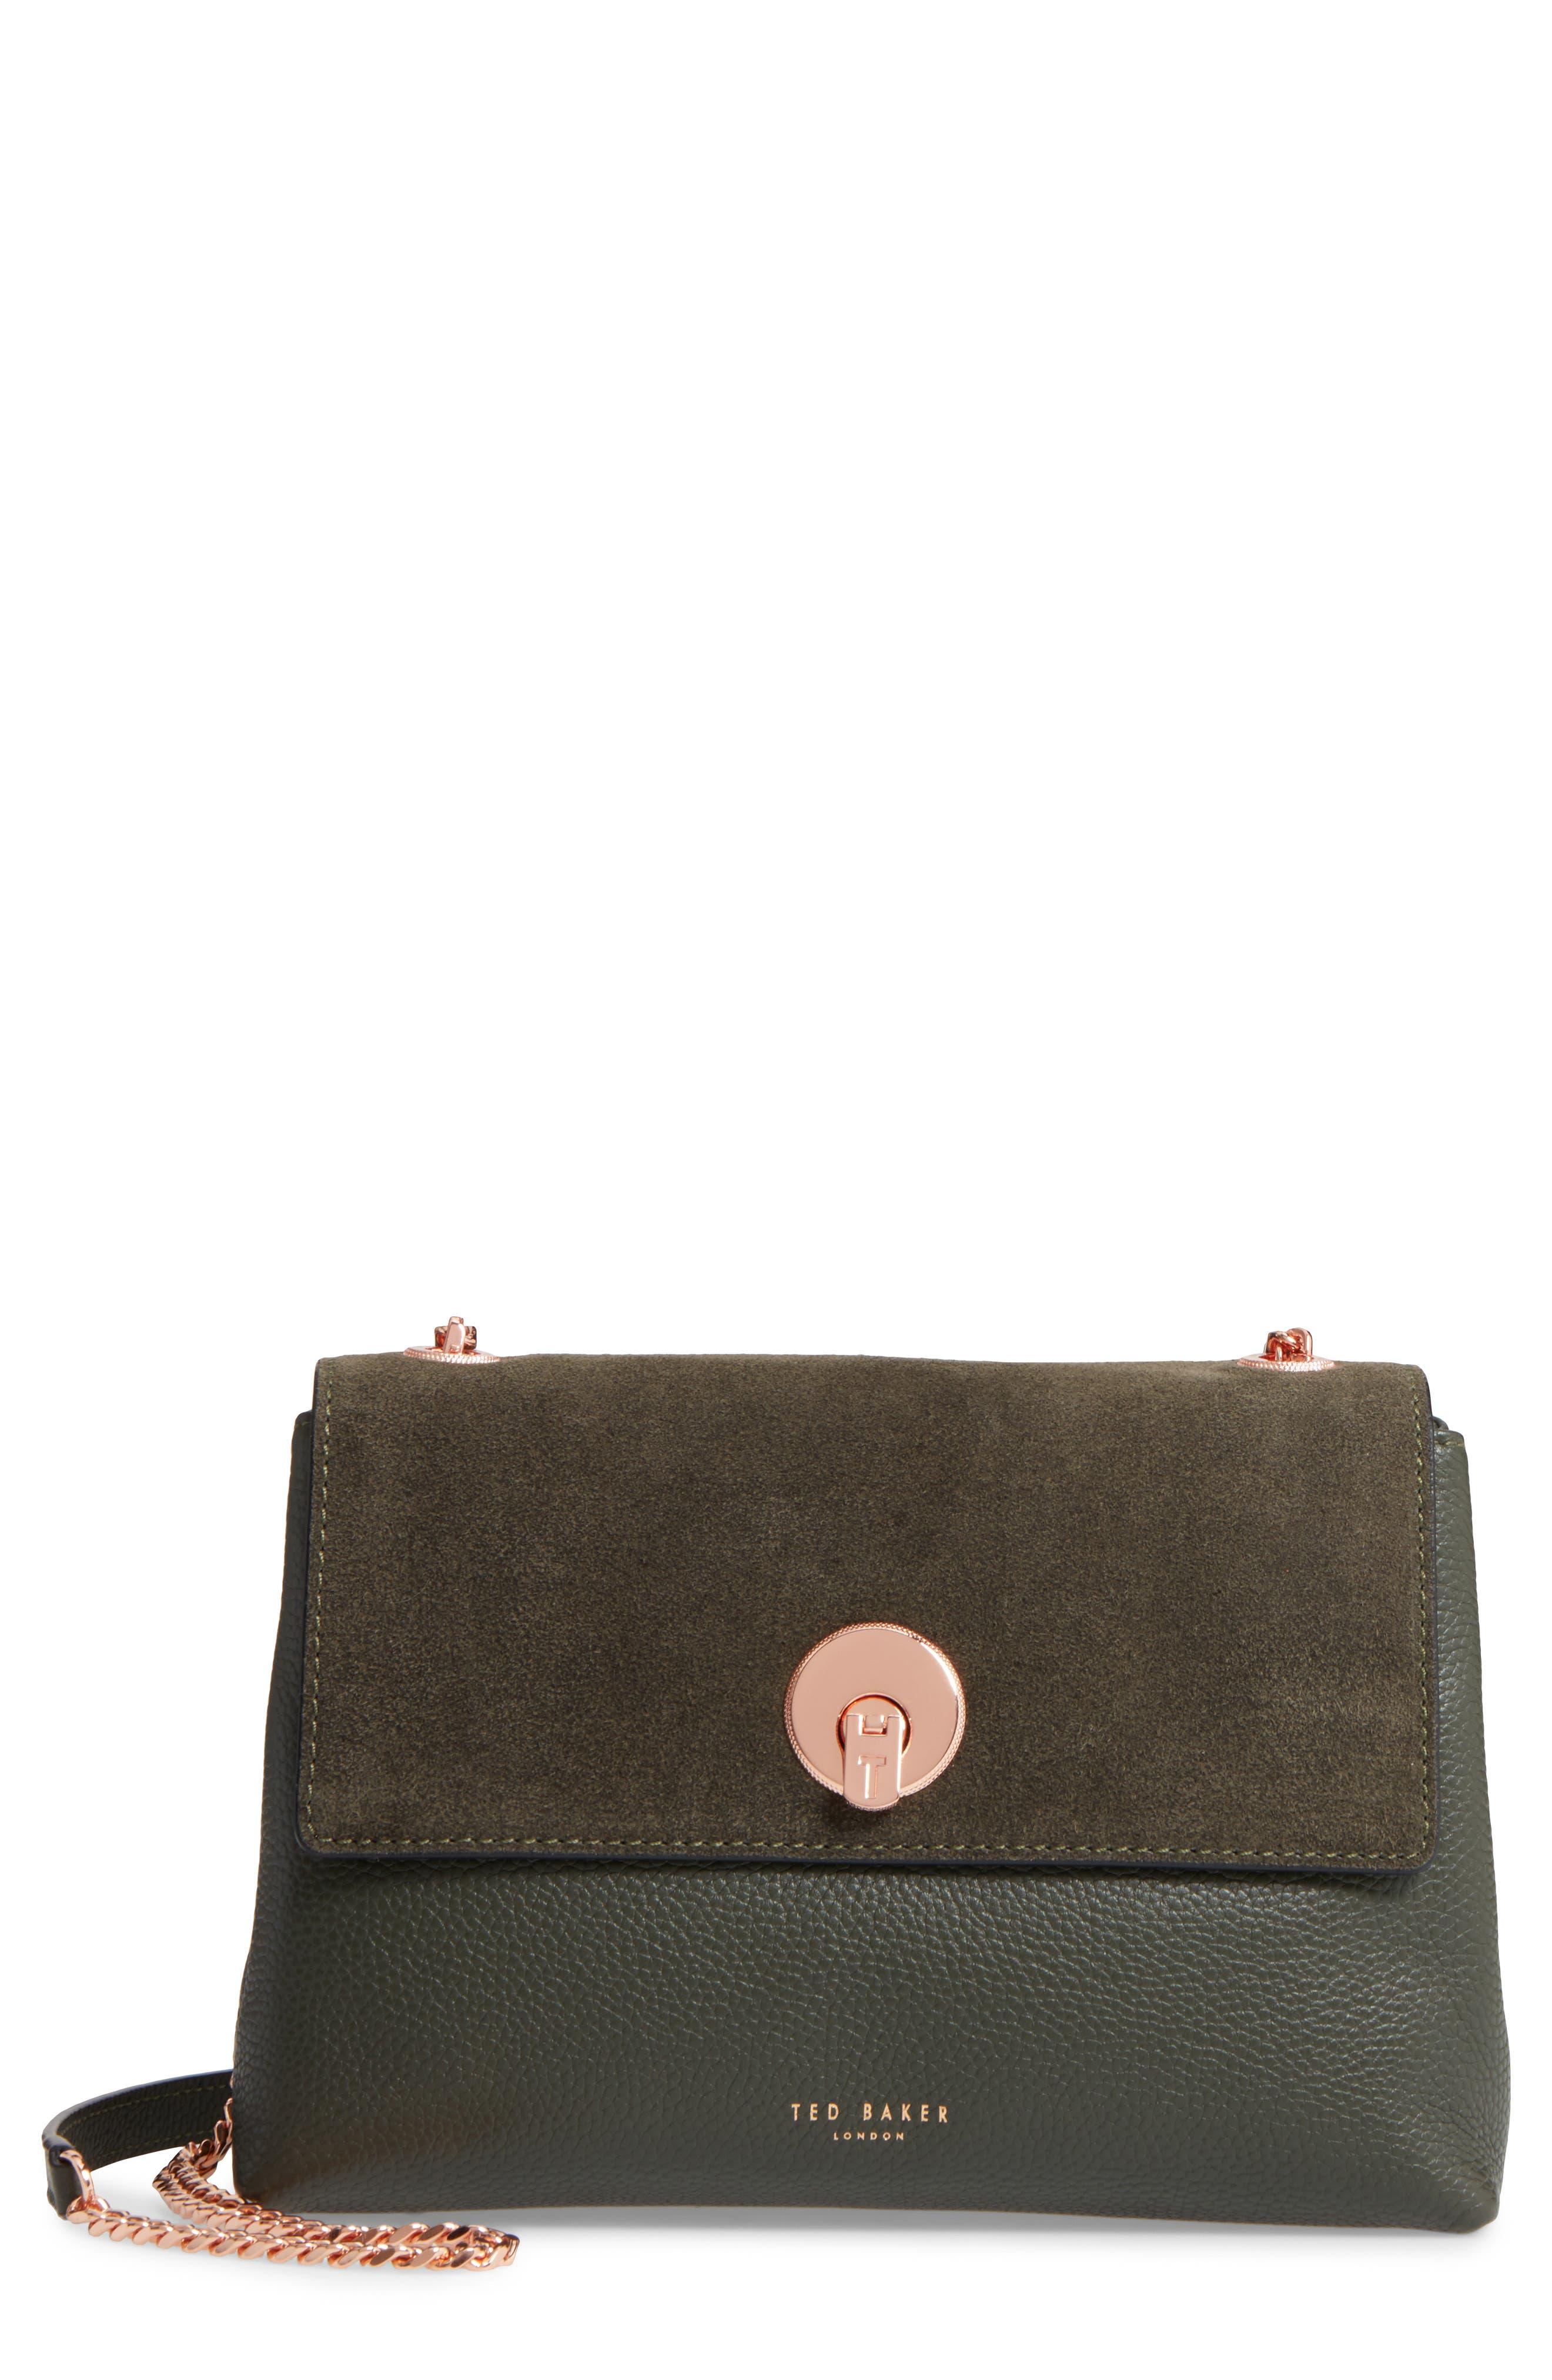 Sorikai Leather & Suede Crossbody Bag,                             Main thumbnail 1, color,                             312